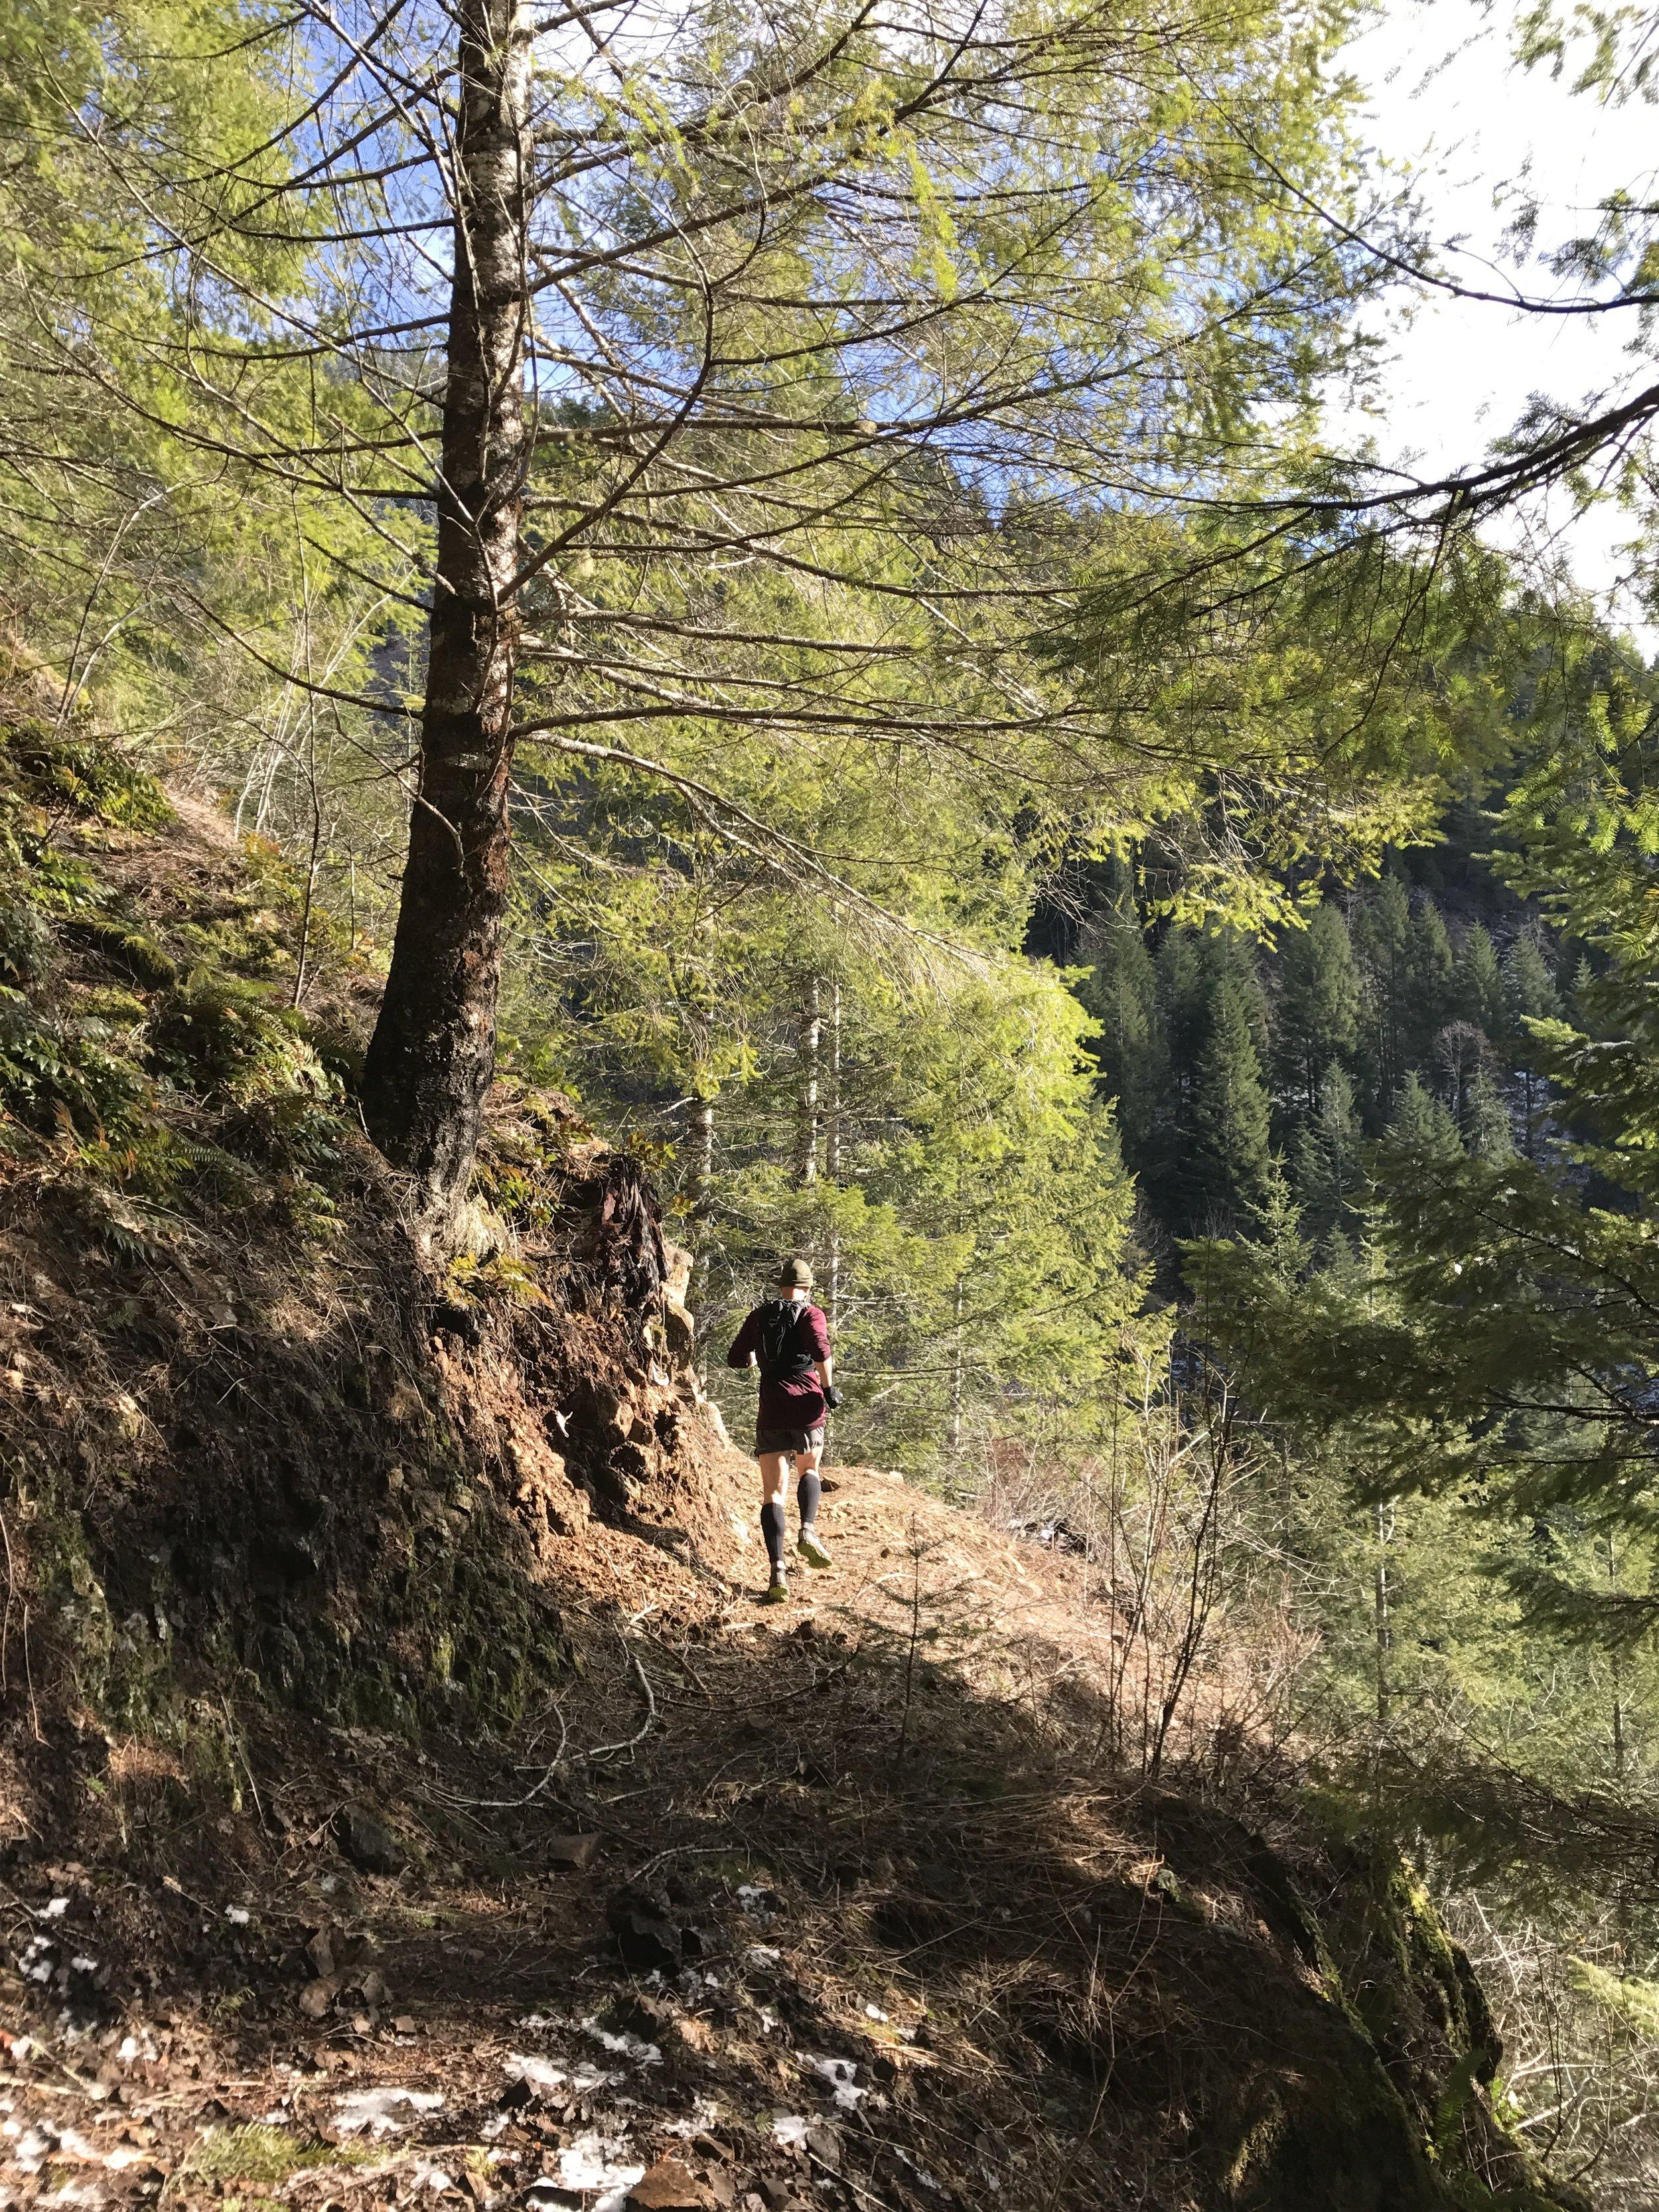 Rounding the corner - Wilson River Trail - Tillamook